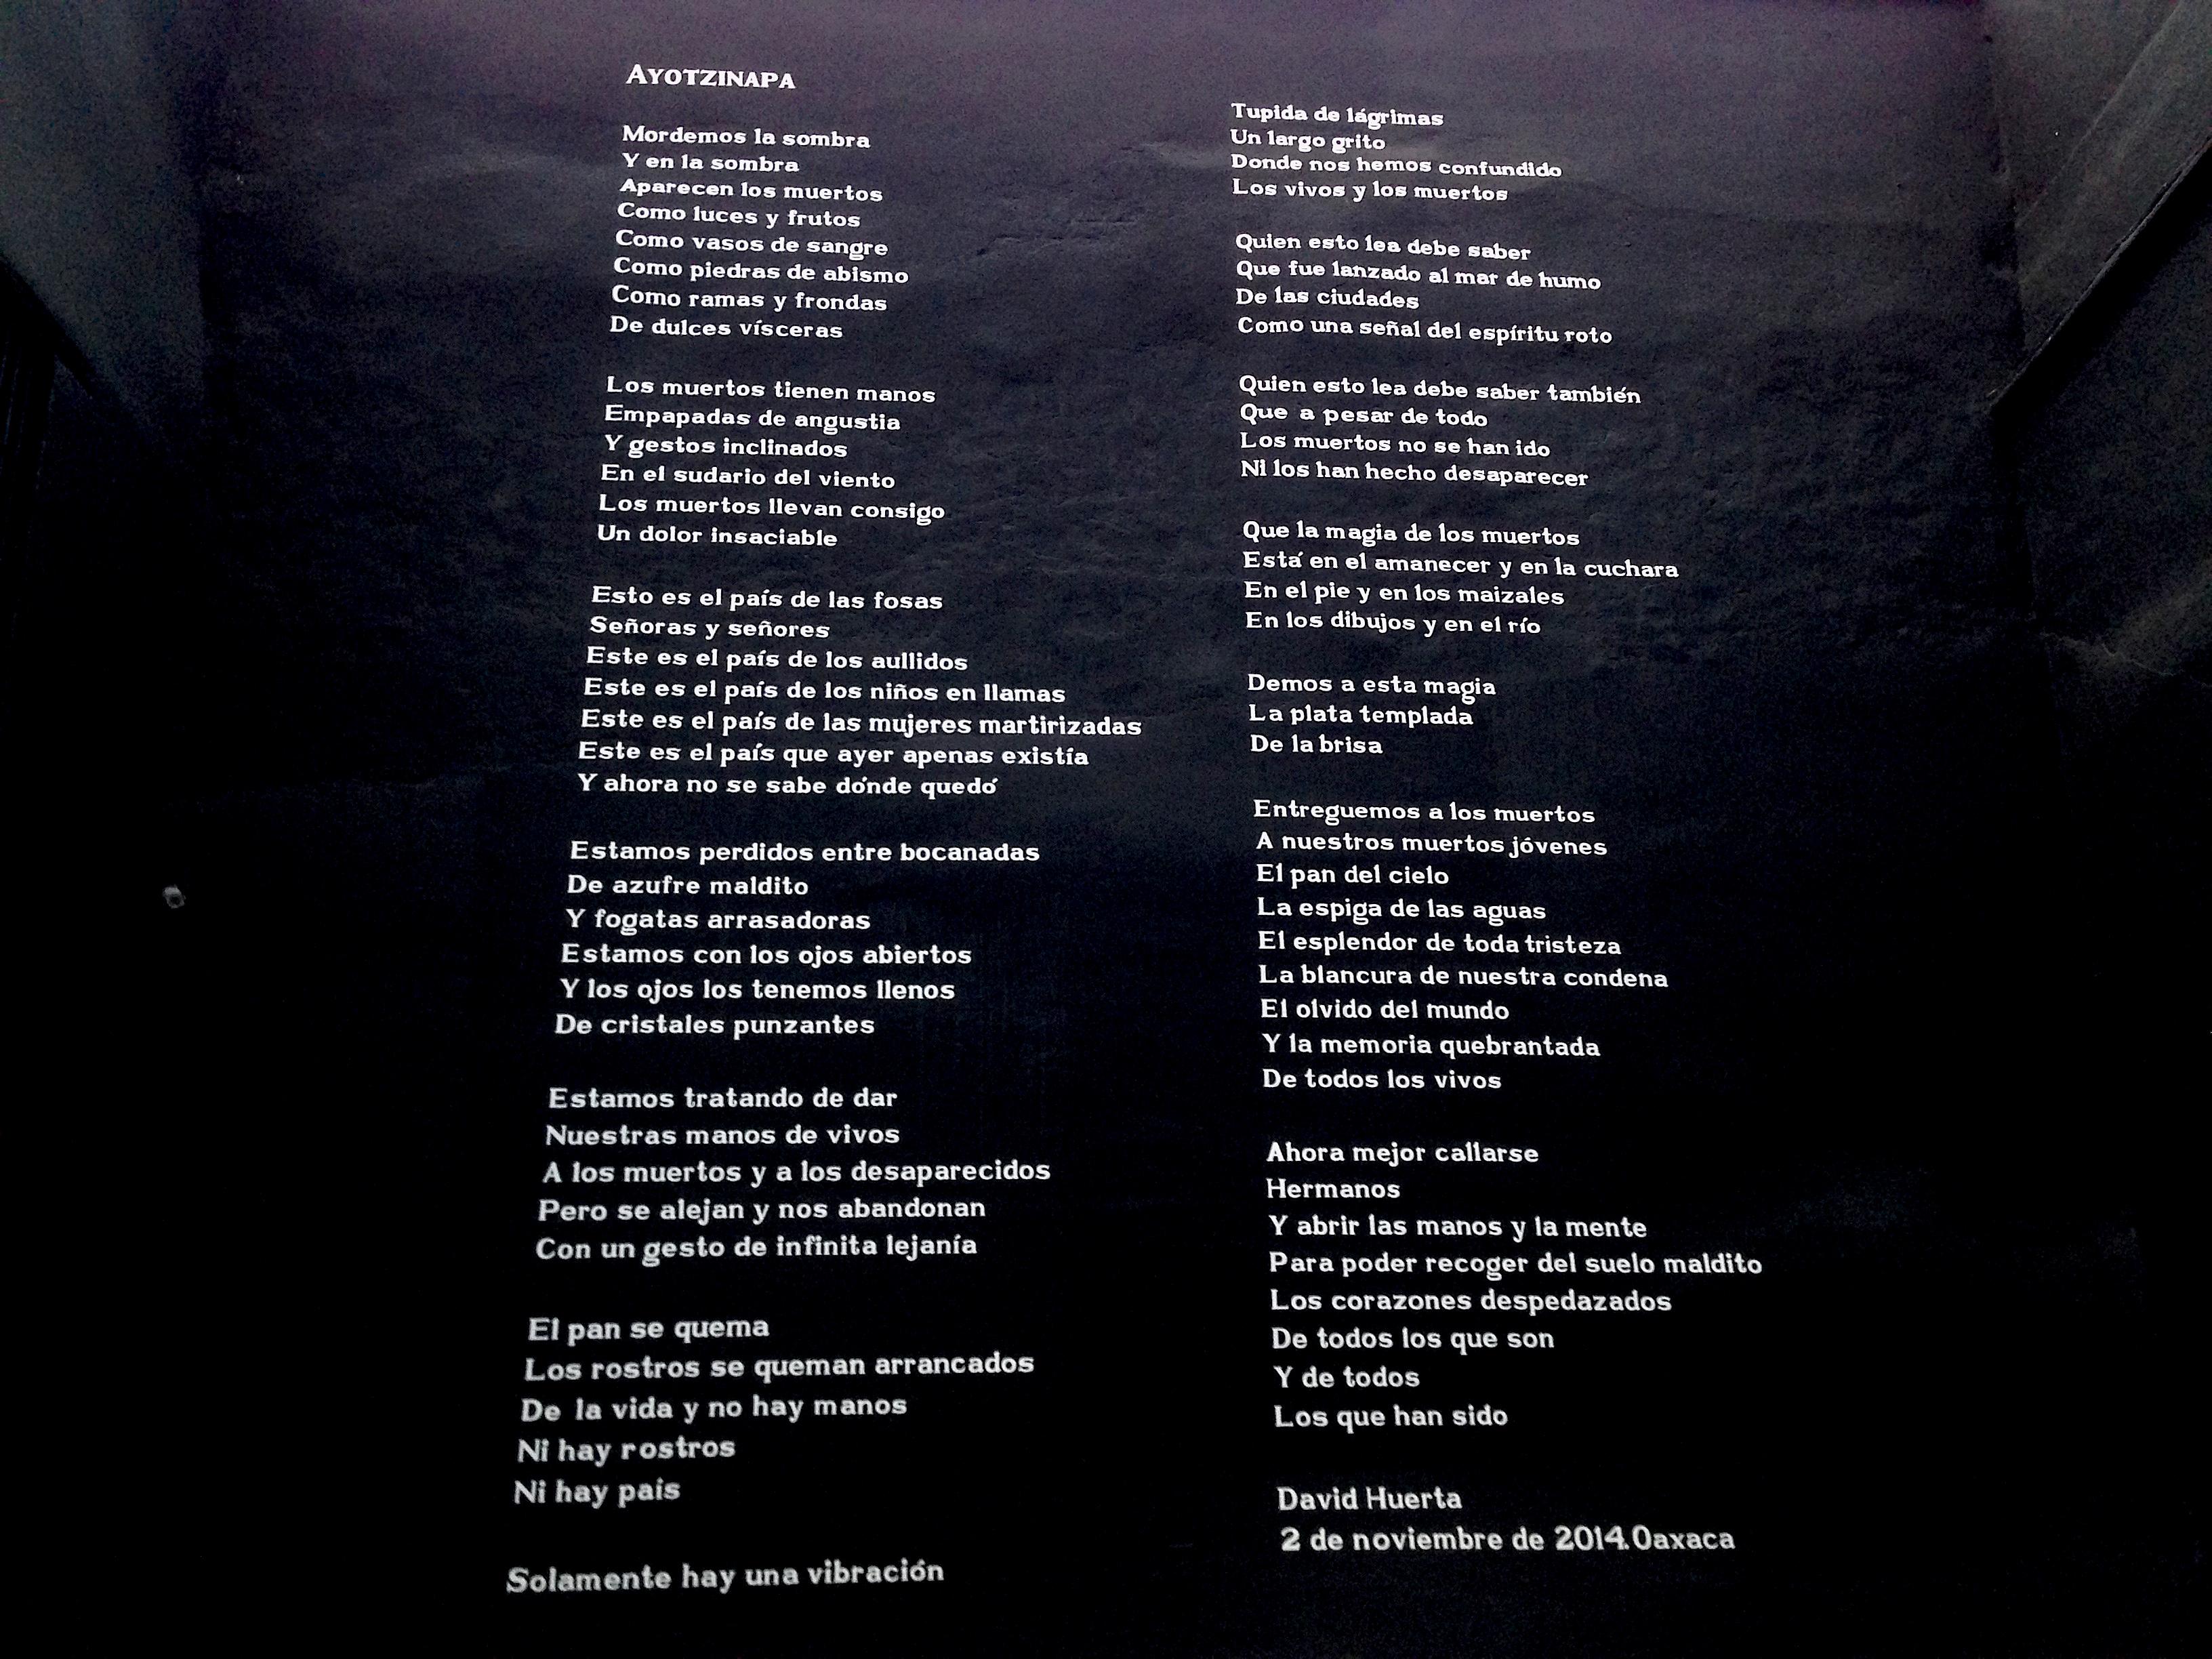 poesia ayotzinapa